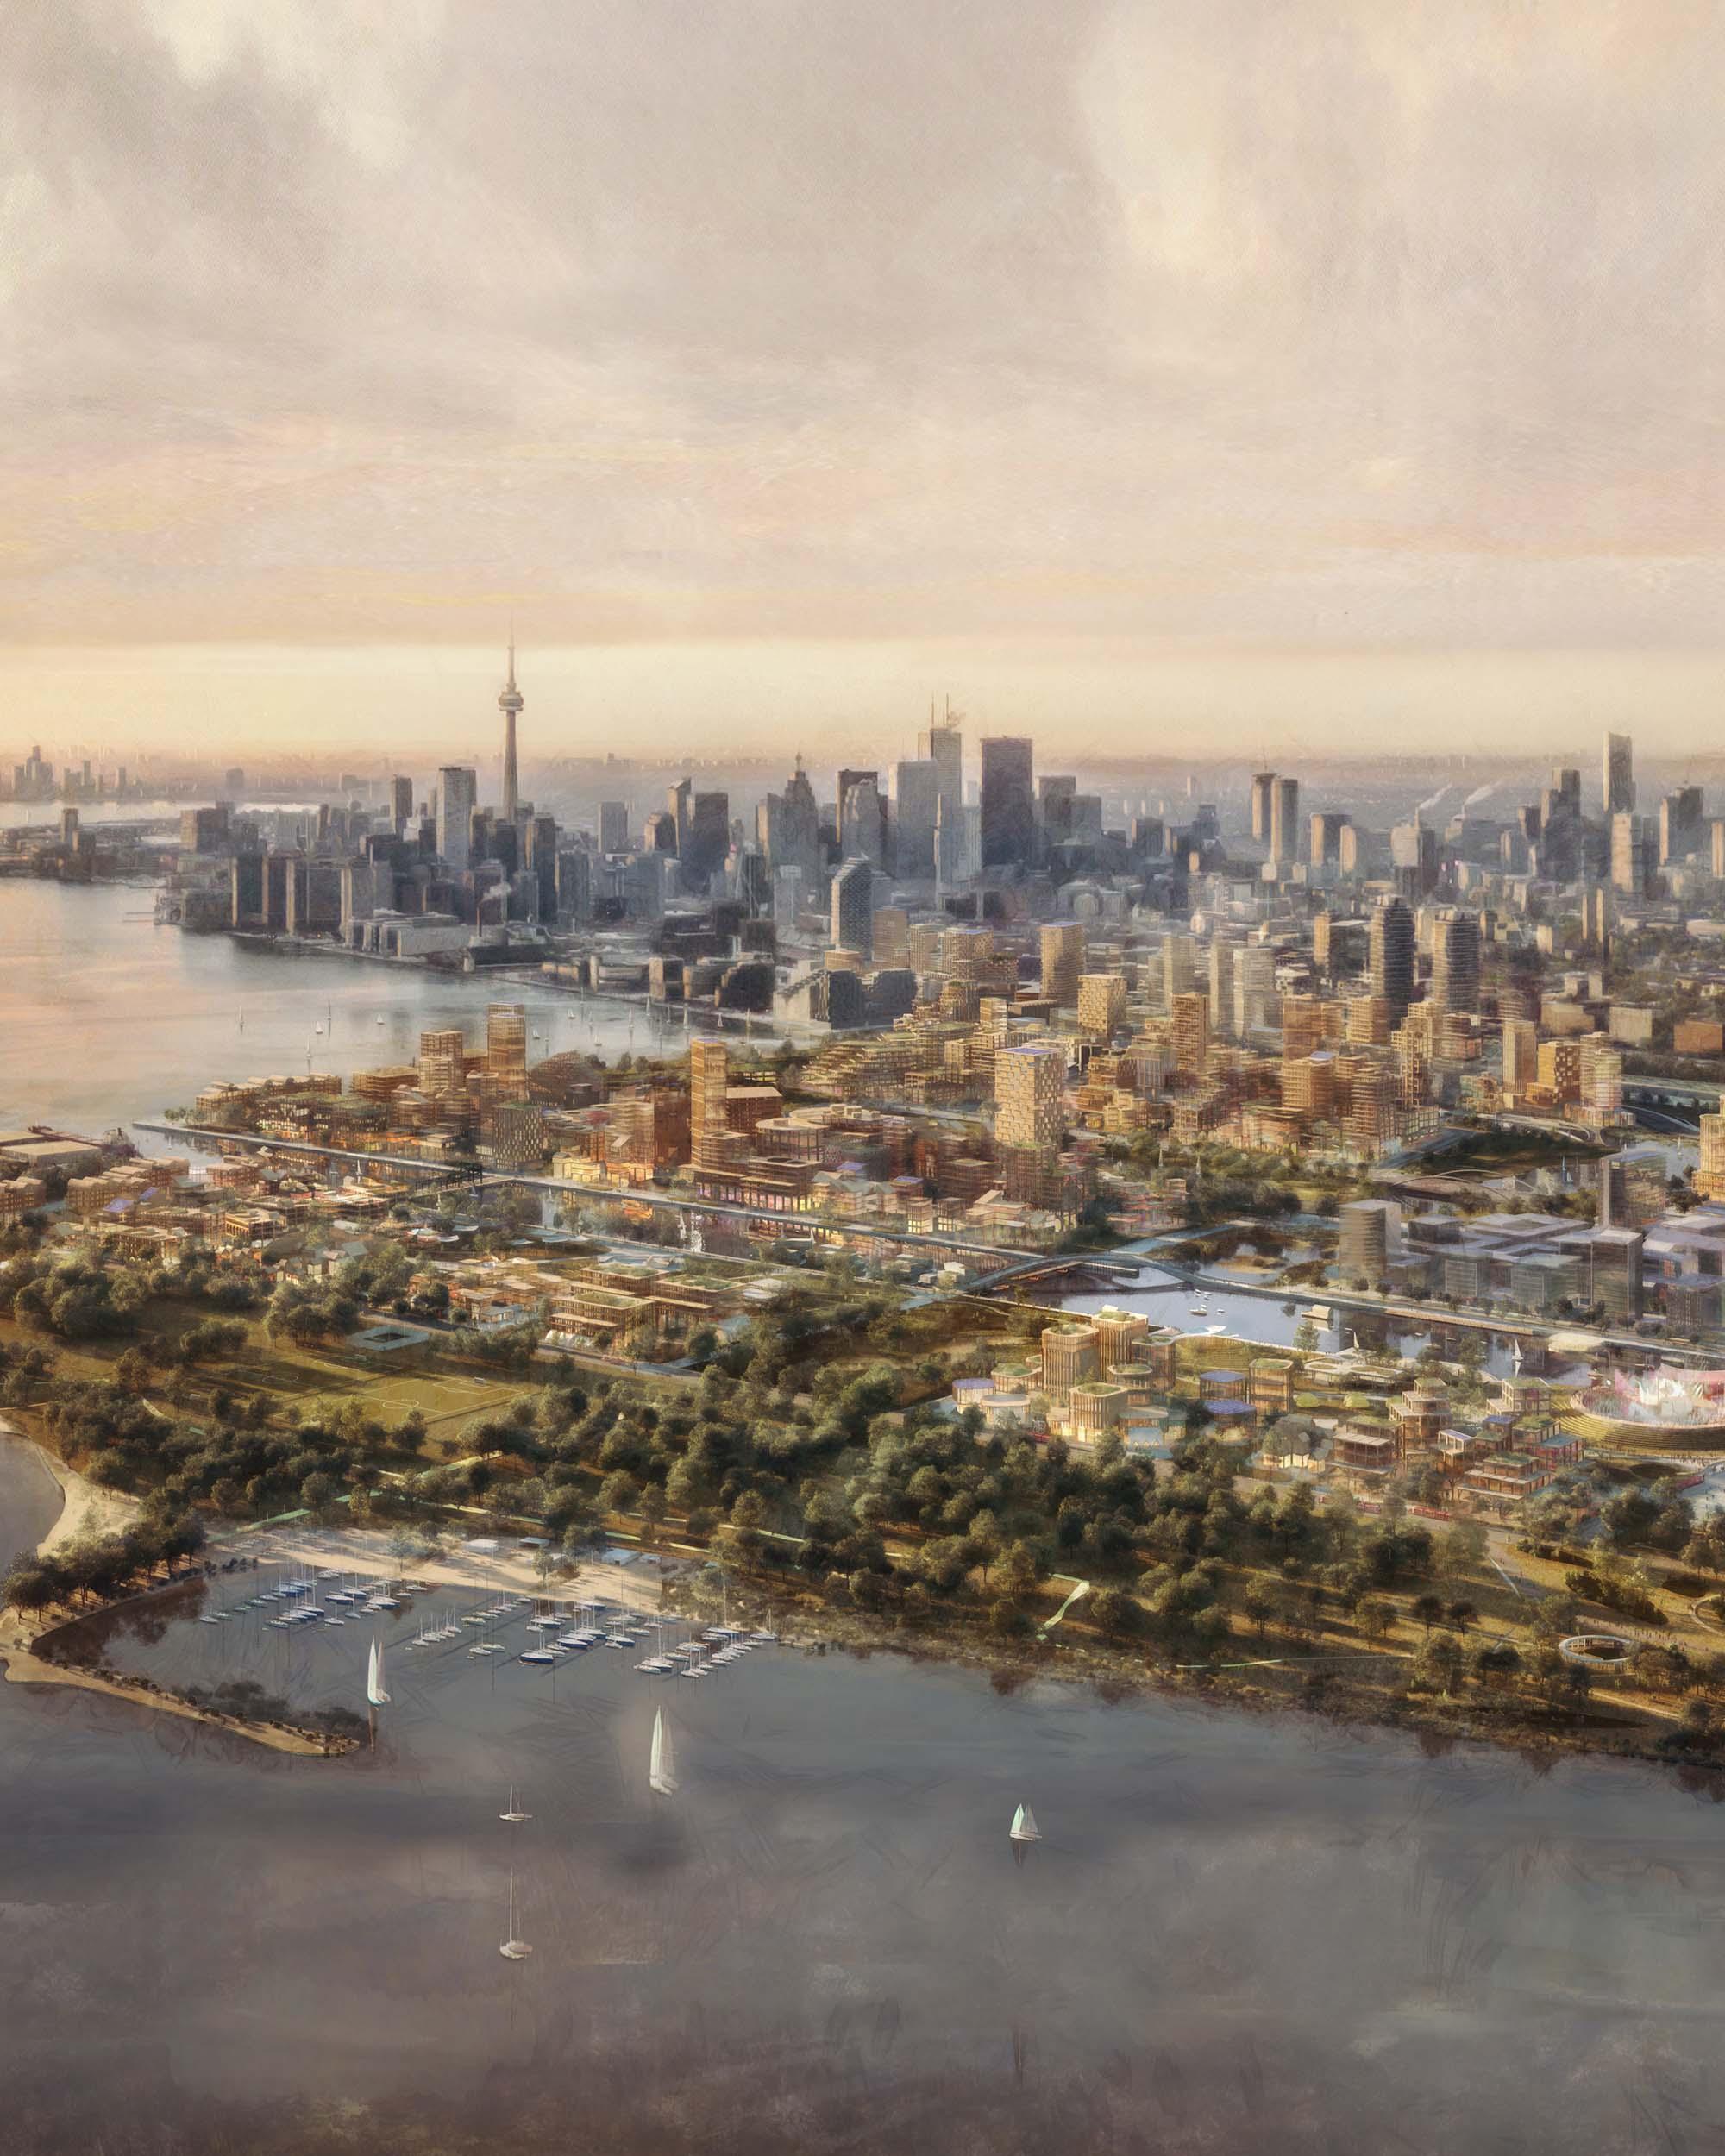 Aerial photo of Toronto